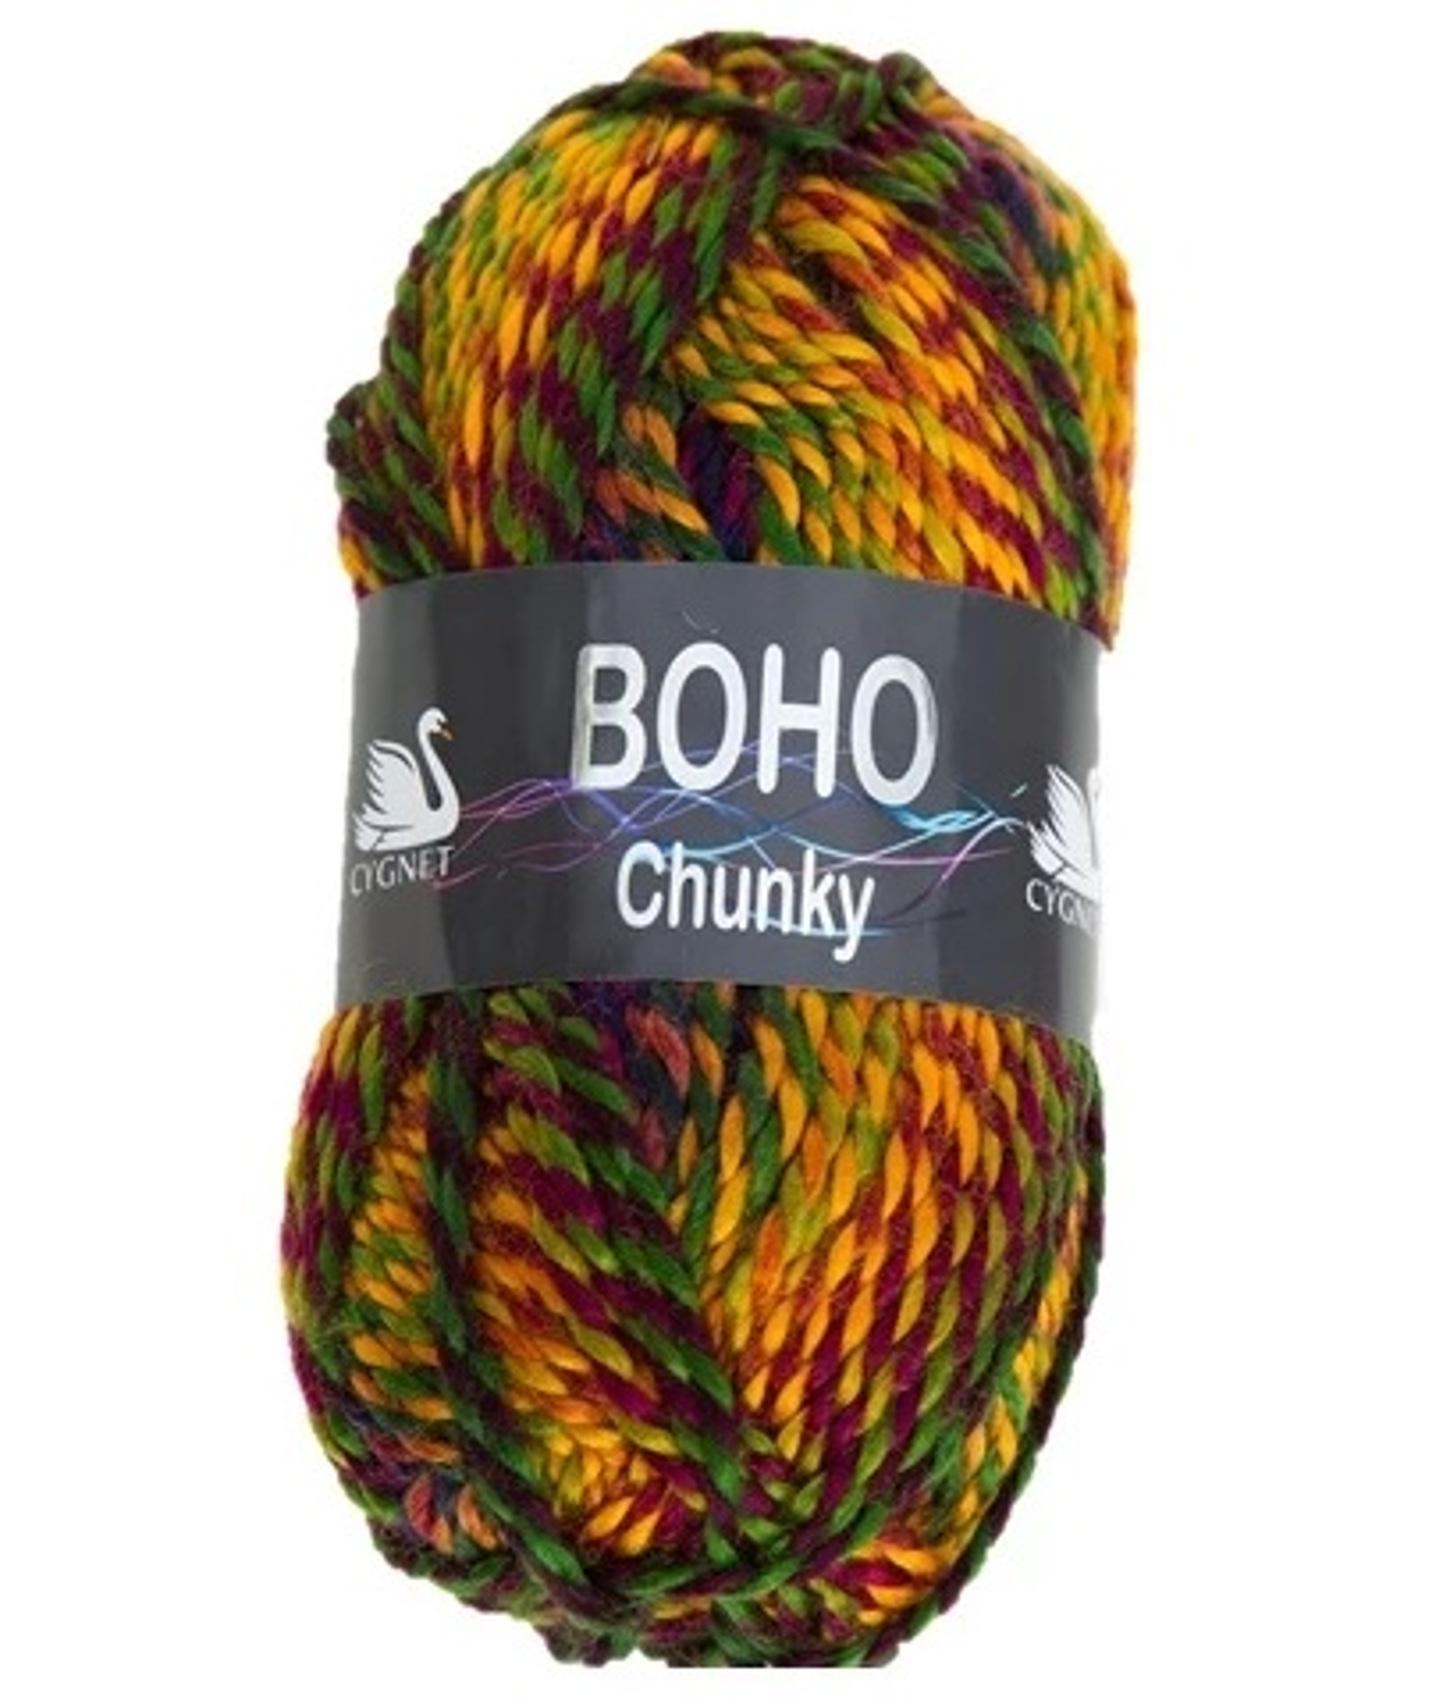 Nouveau Cygnet Boho Chunky Premium Acrylique Laine à Tricoter Crochet Yarn 100 G boule